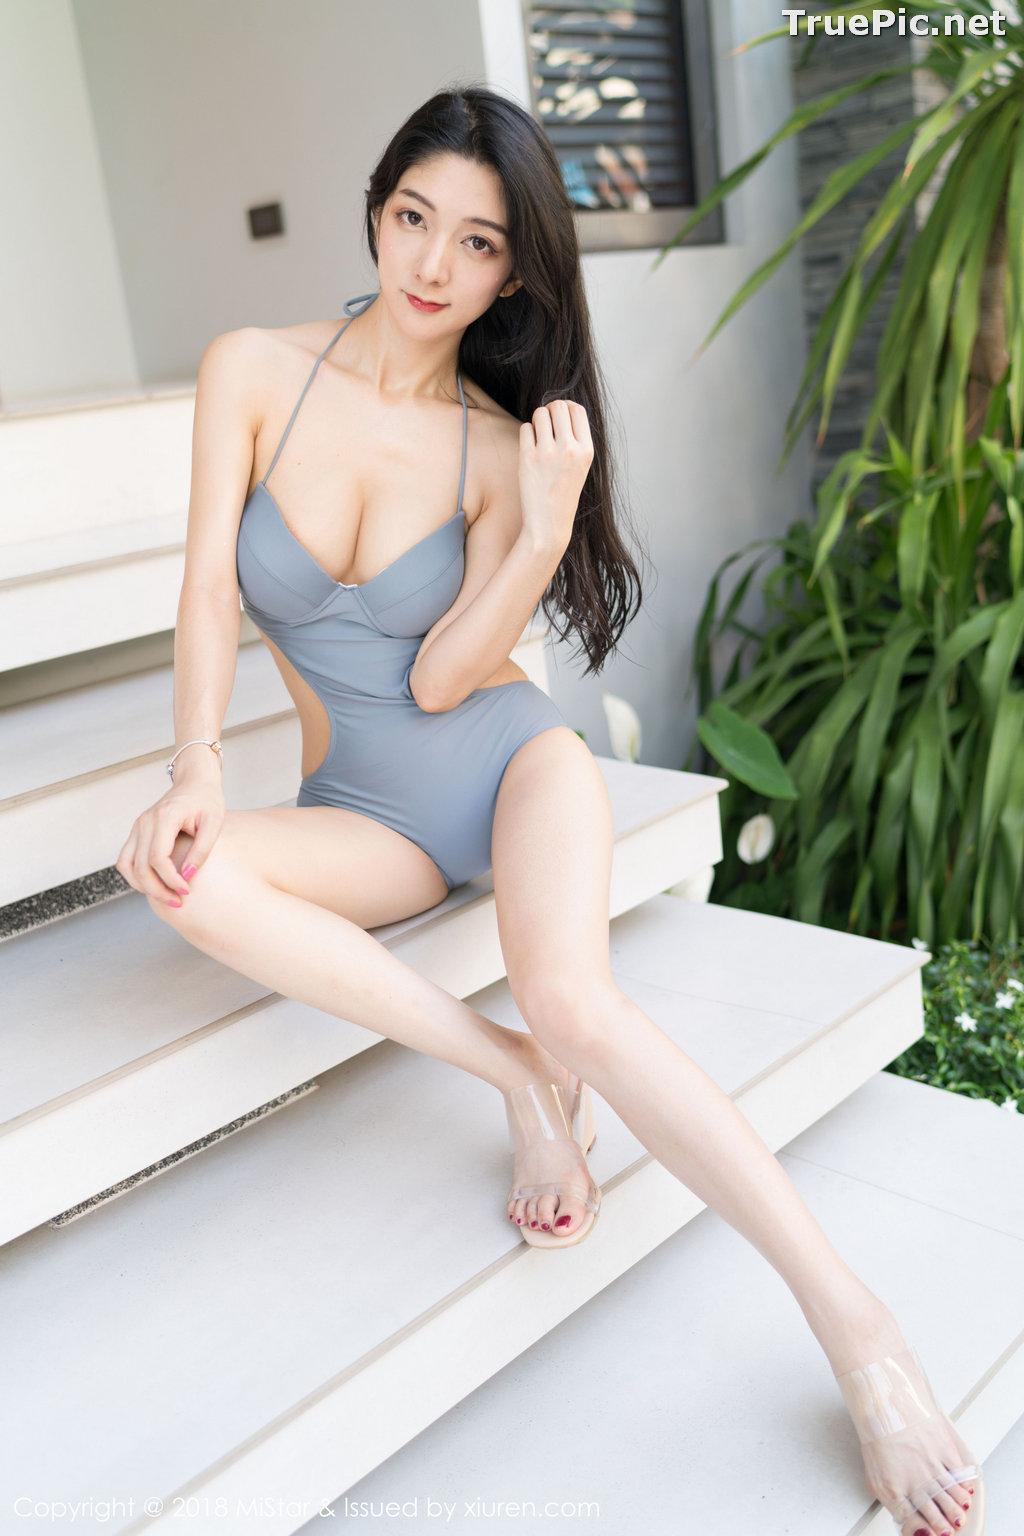 Image MiStar Vol.238 - Chinese Model - Xiao Reba (Angela小热巴) - Sleep Dress and Monokini - TruePic.net - Picture-33